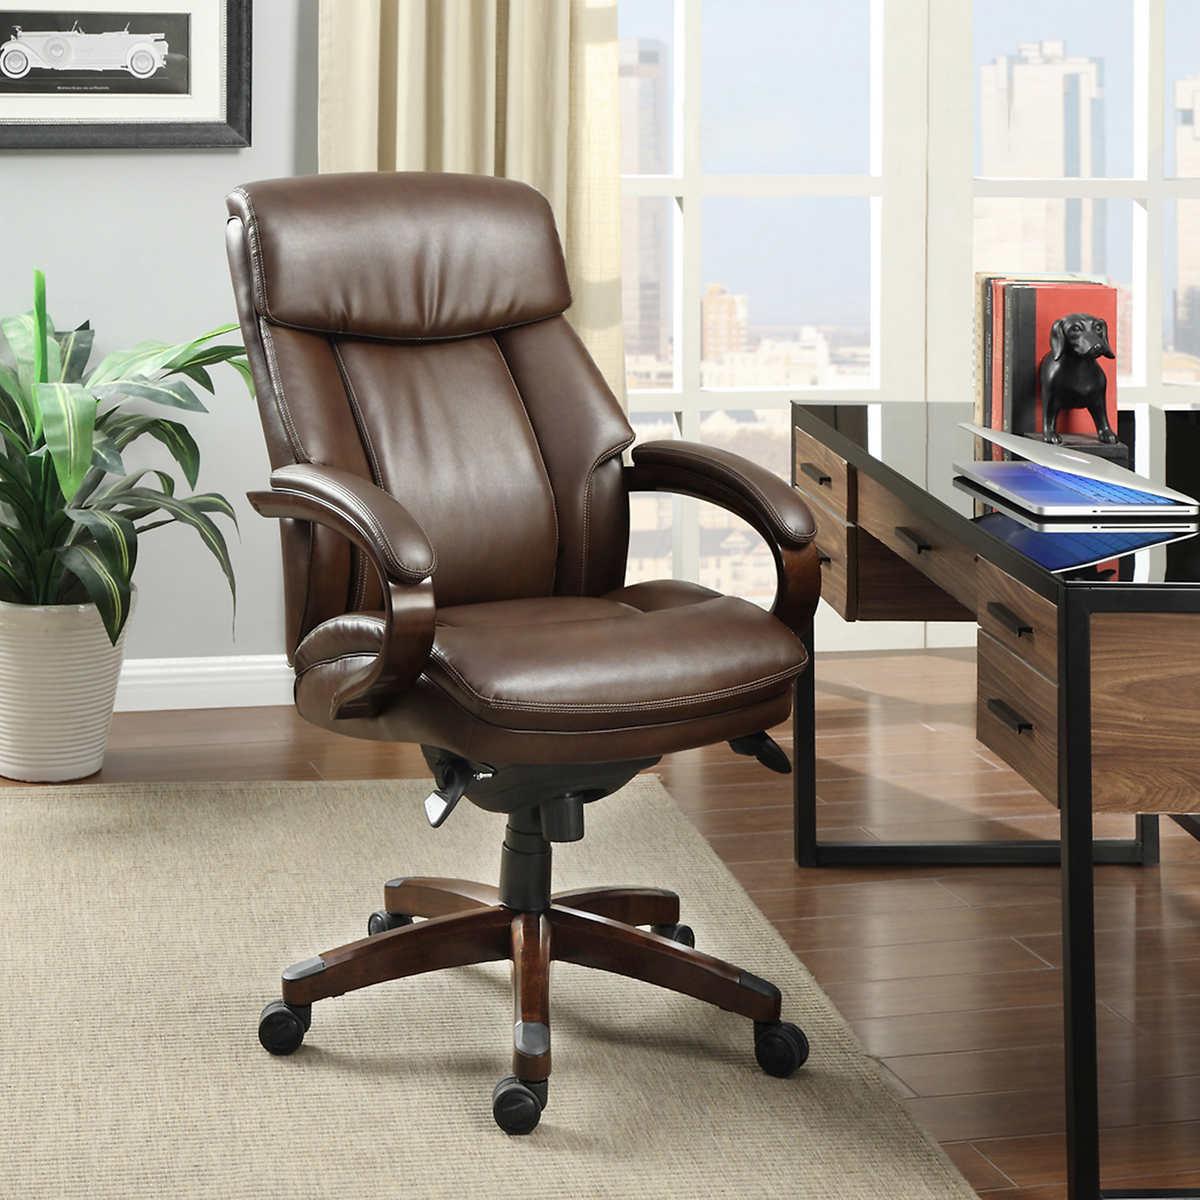 La-Z-Boy Executive Leather Office Chair 757104161563 | eBay